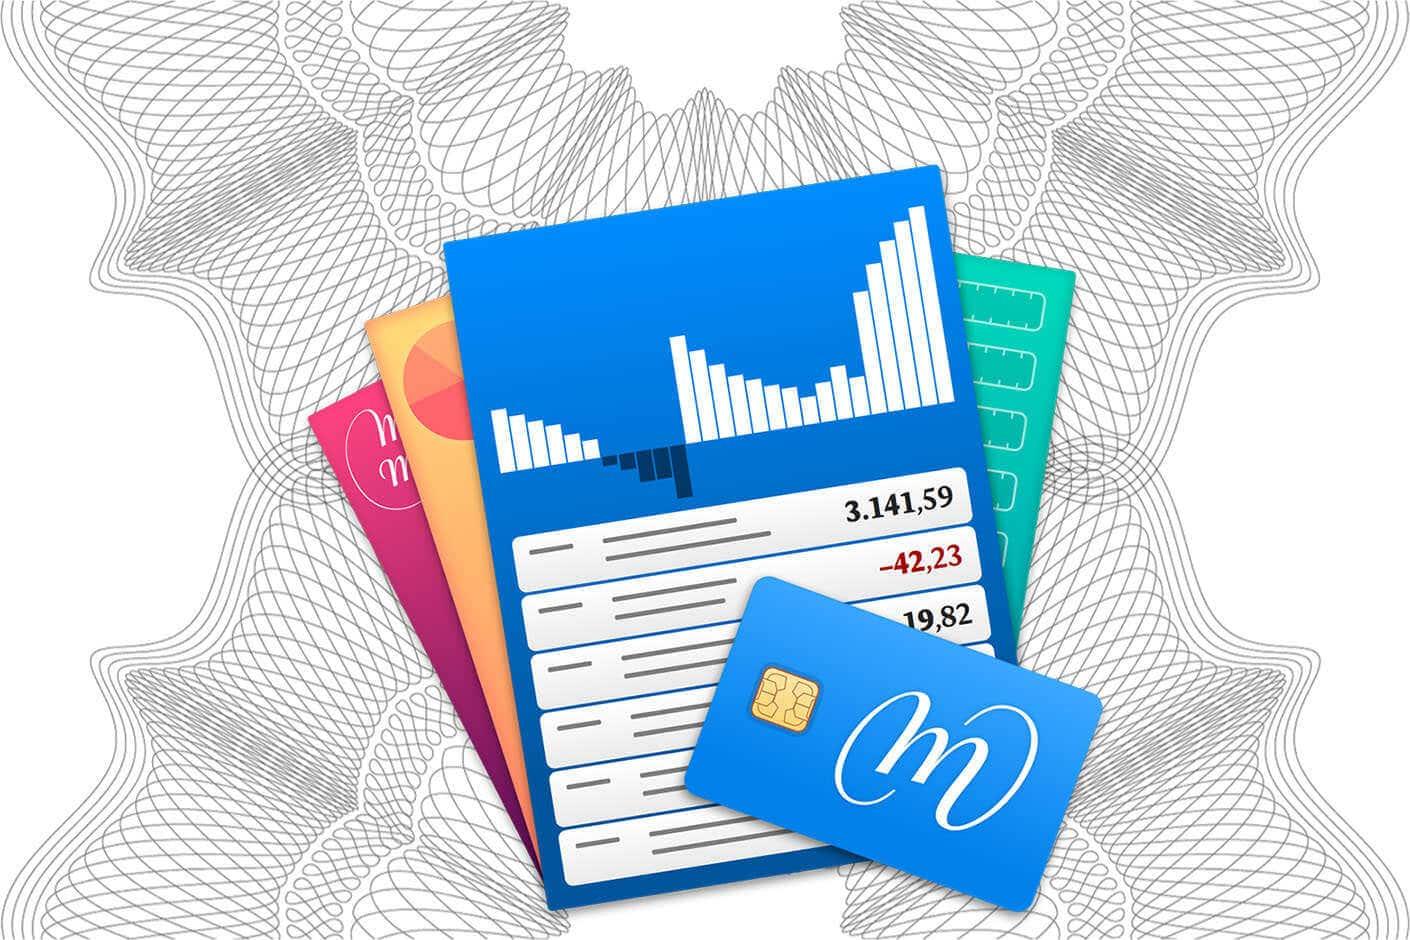 Banking App MoneyMoney